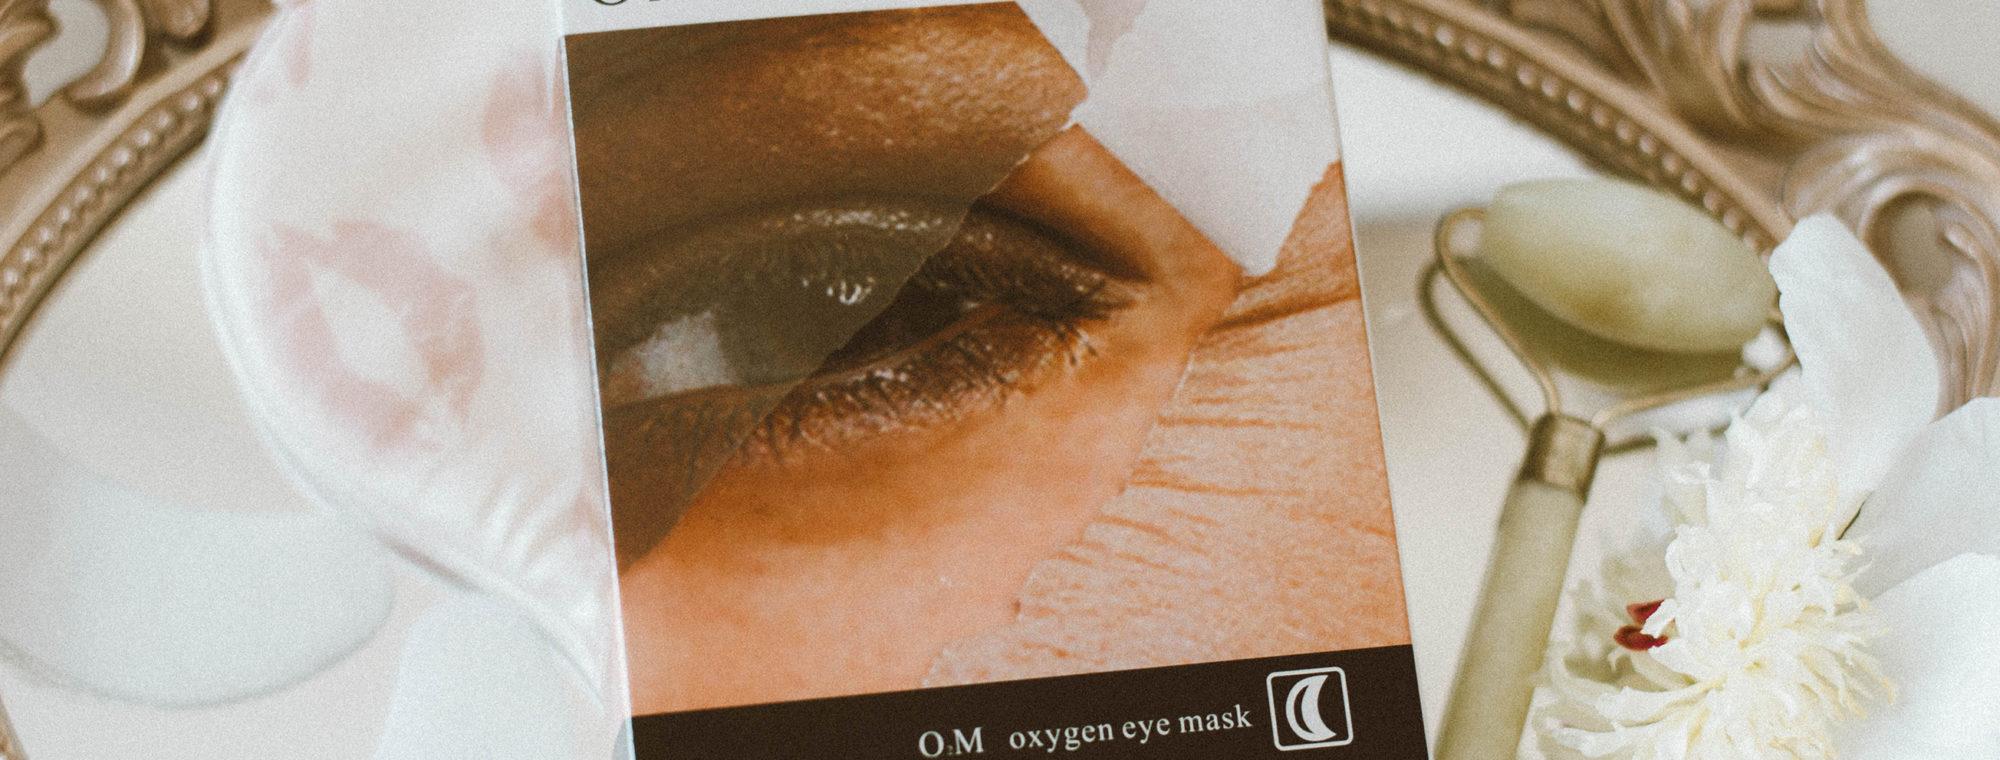 VIIcode O2M Oxygen Eye Mask For Dark Circles Review